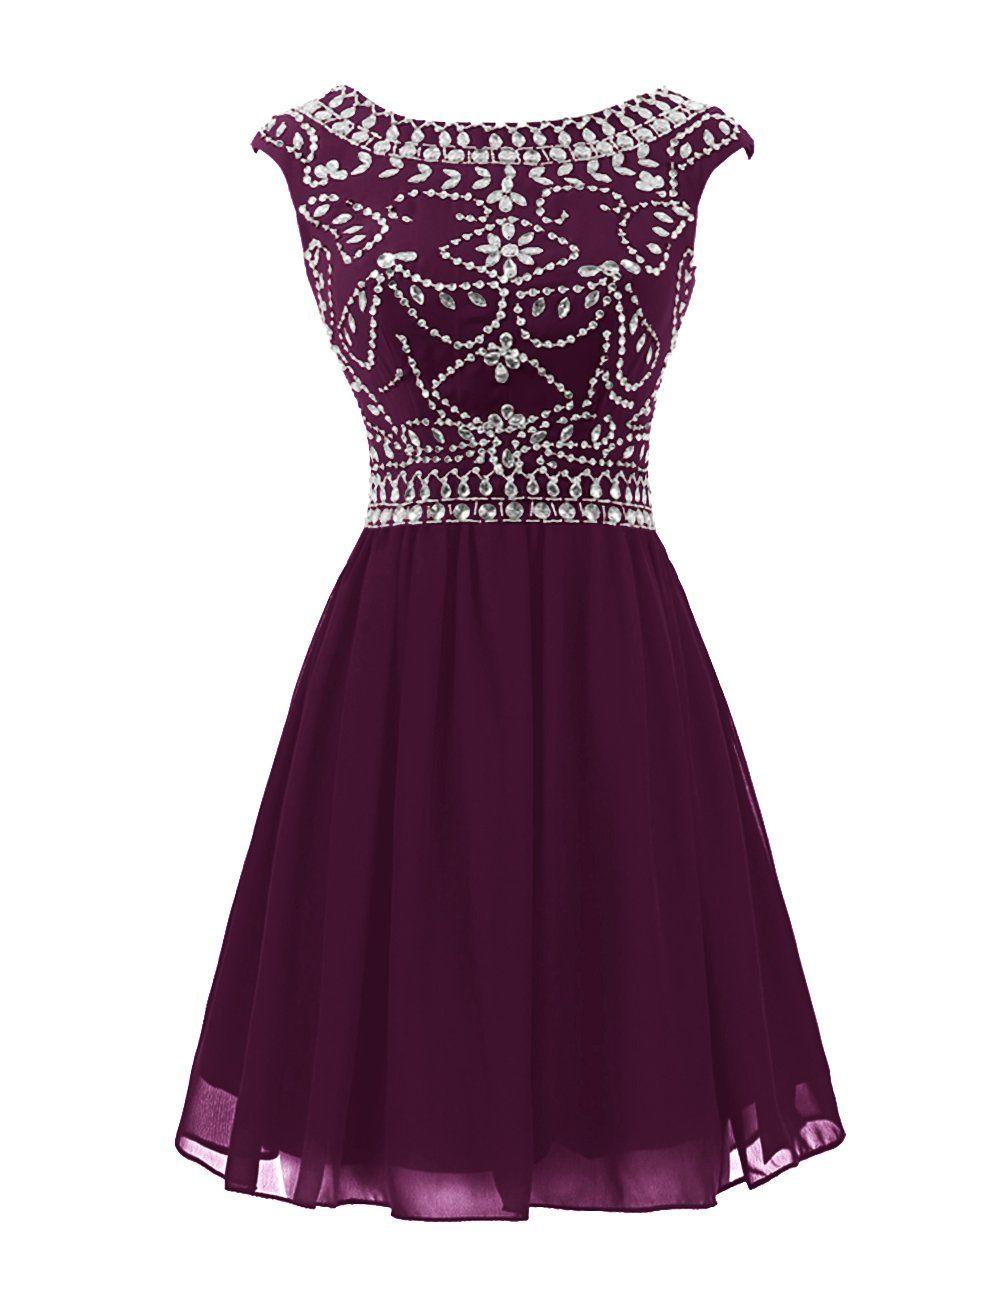 Wedtrend womenus short prom dress with beads chiffon cocktail dress